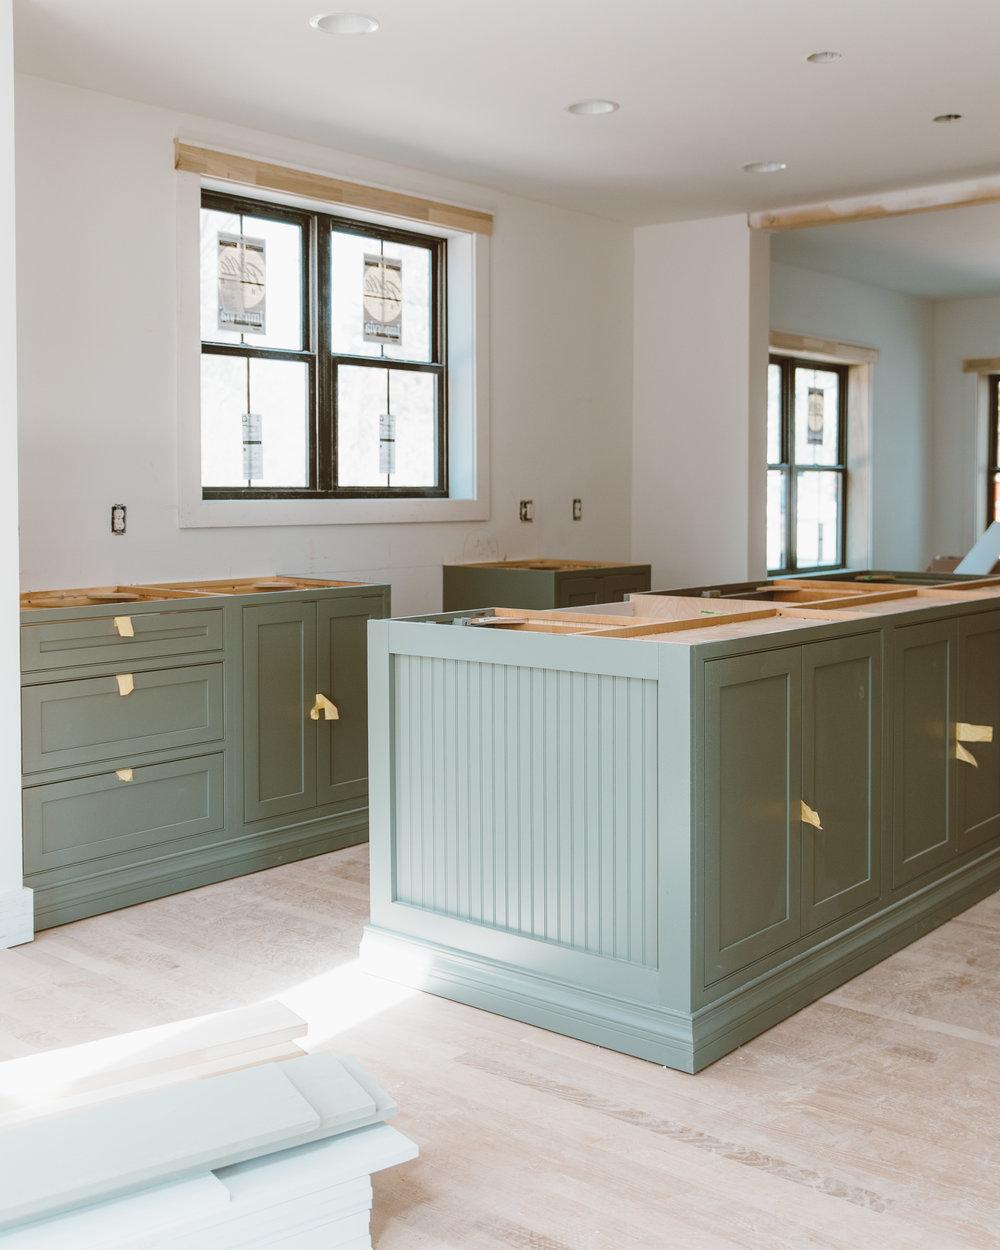 forthehome-kitchencabinets3.jpg